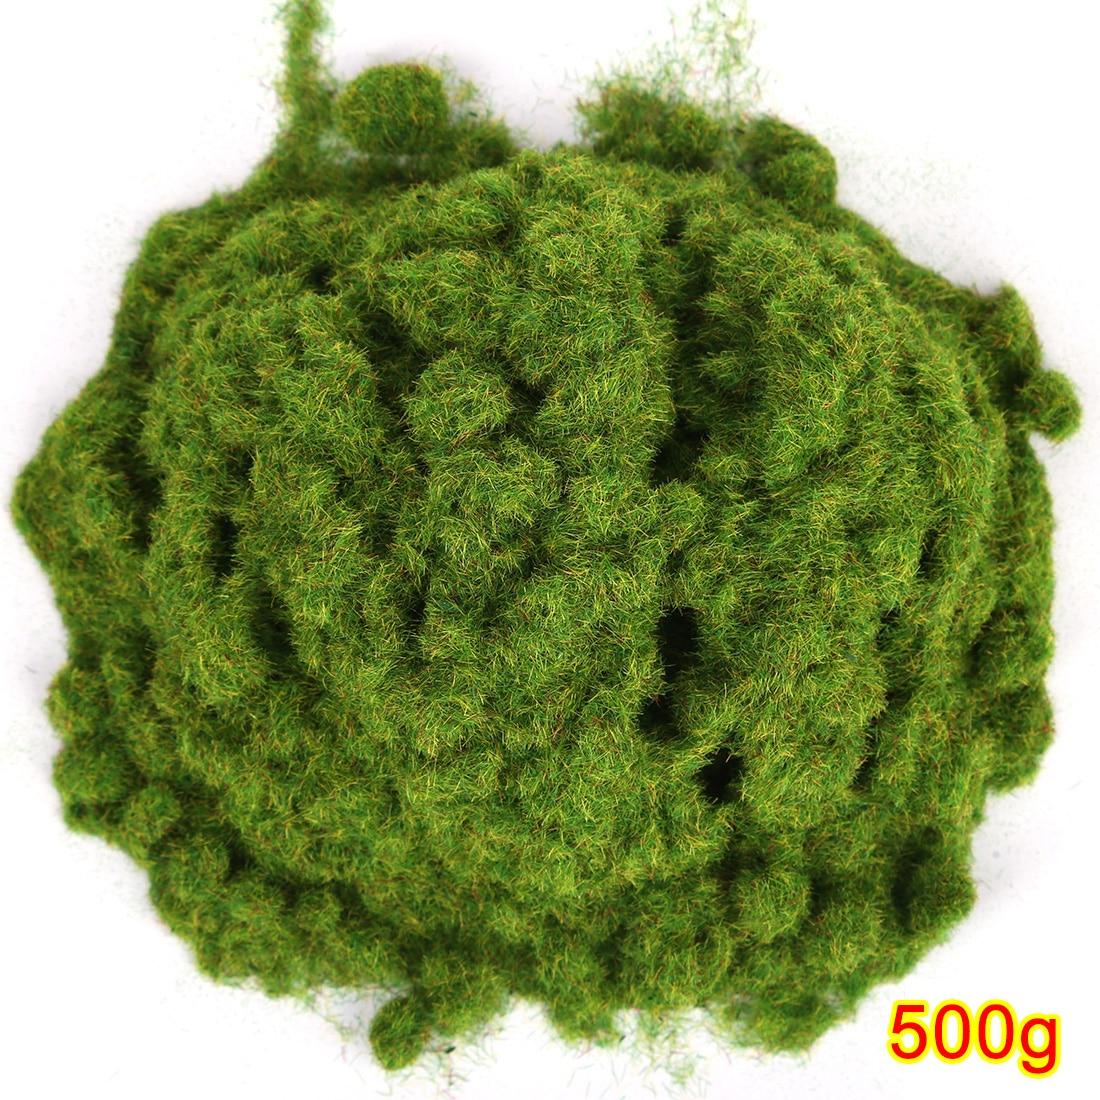 Polvo de hierba Artificial 500g DIY, modelo de tren, mesa de arena, modelo decorativo, Kits de construcción-amarillo verde